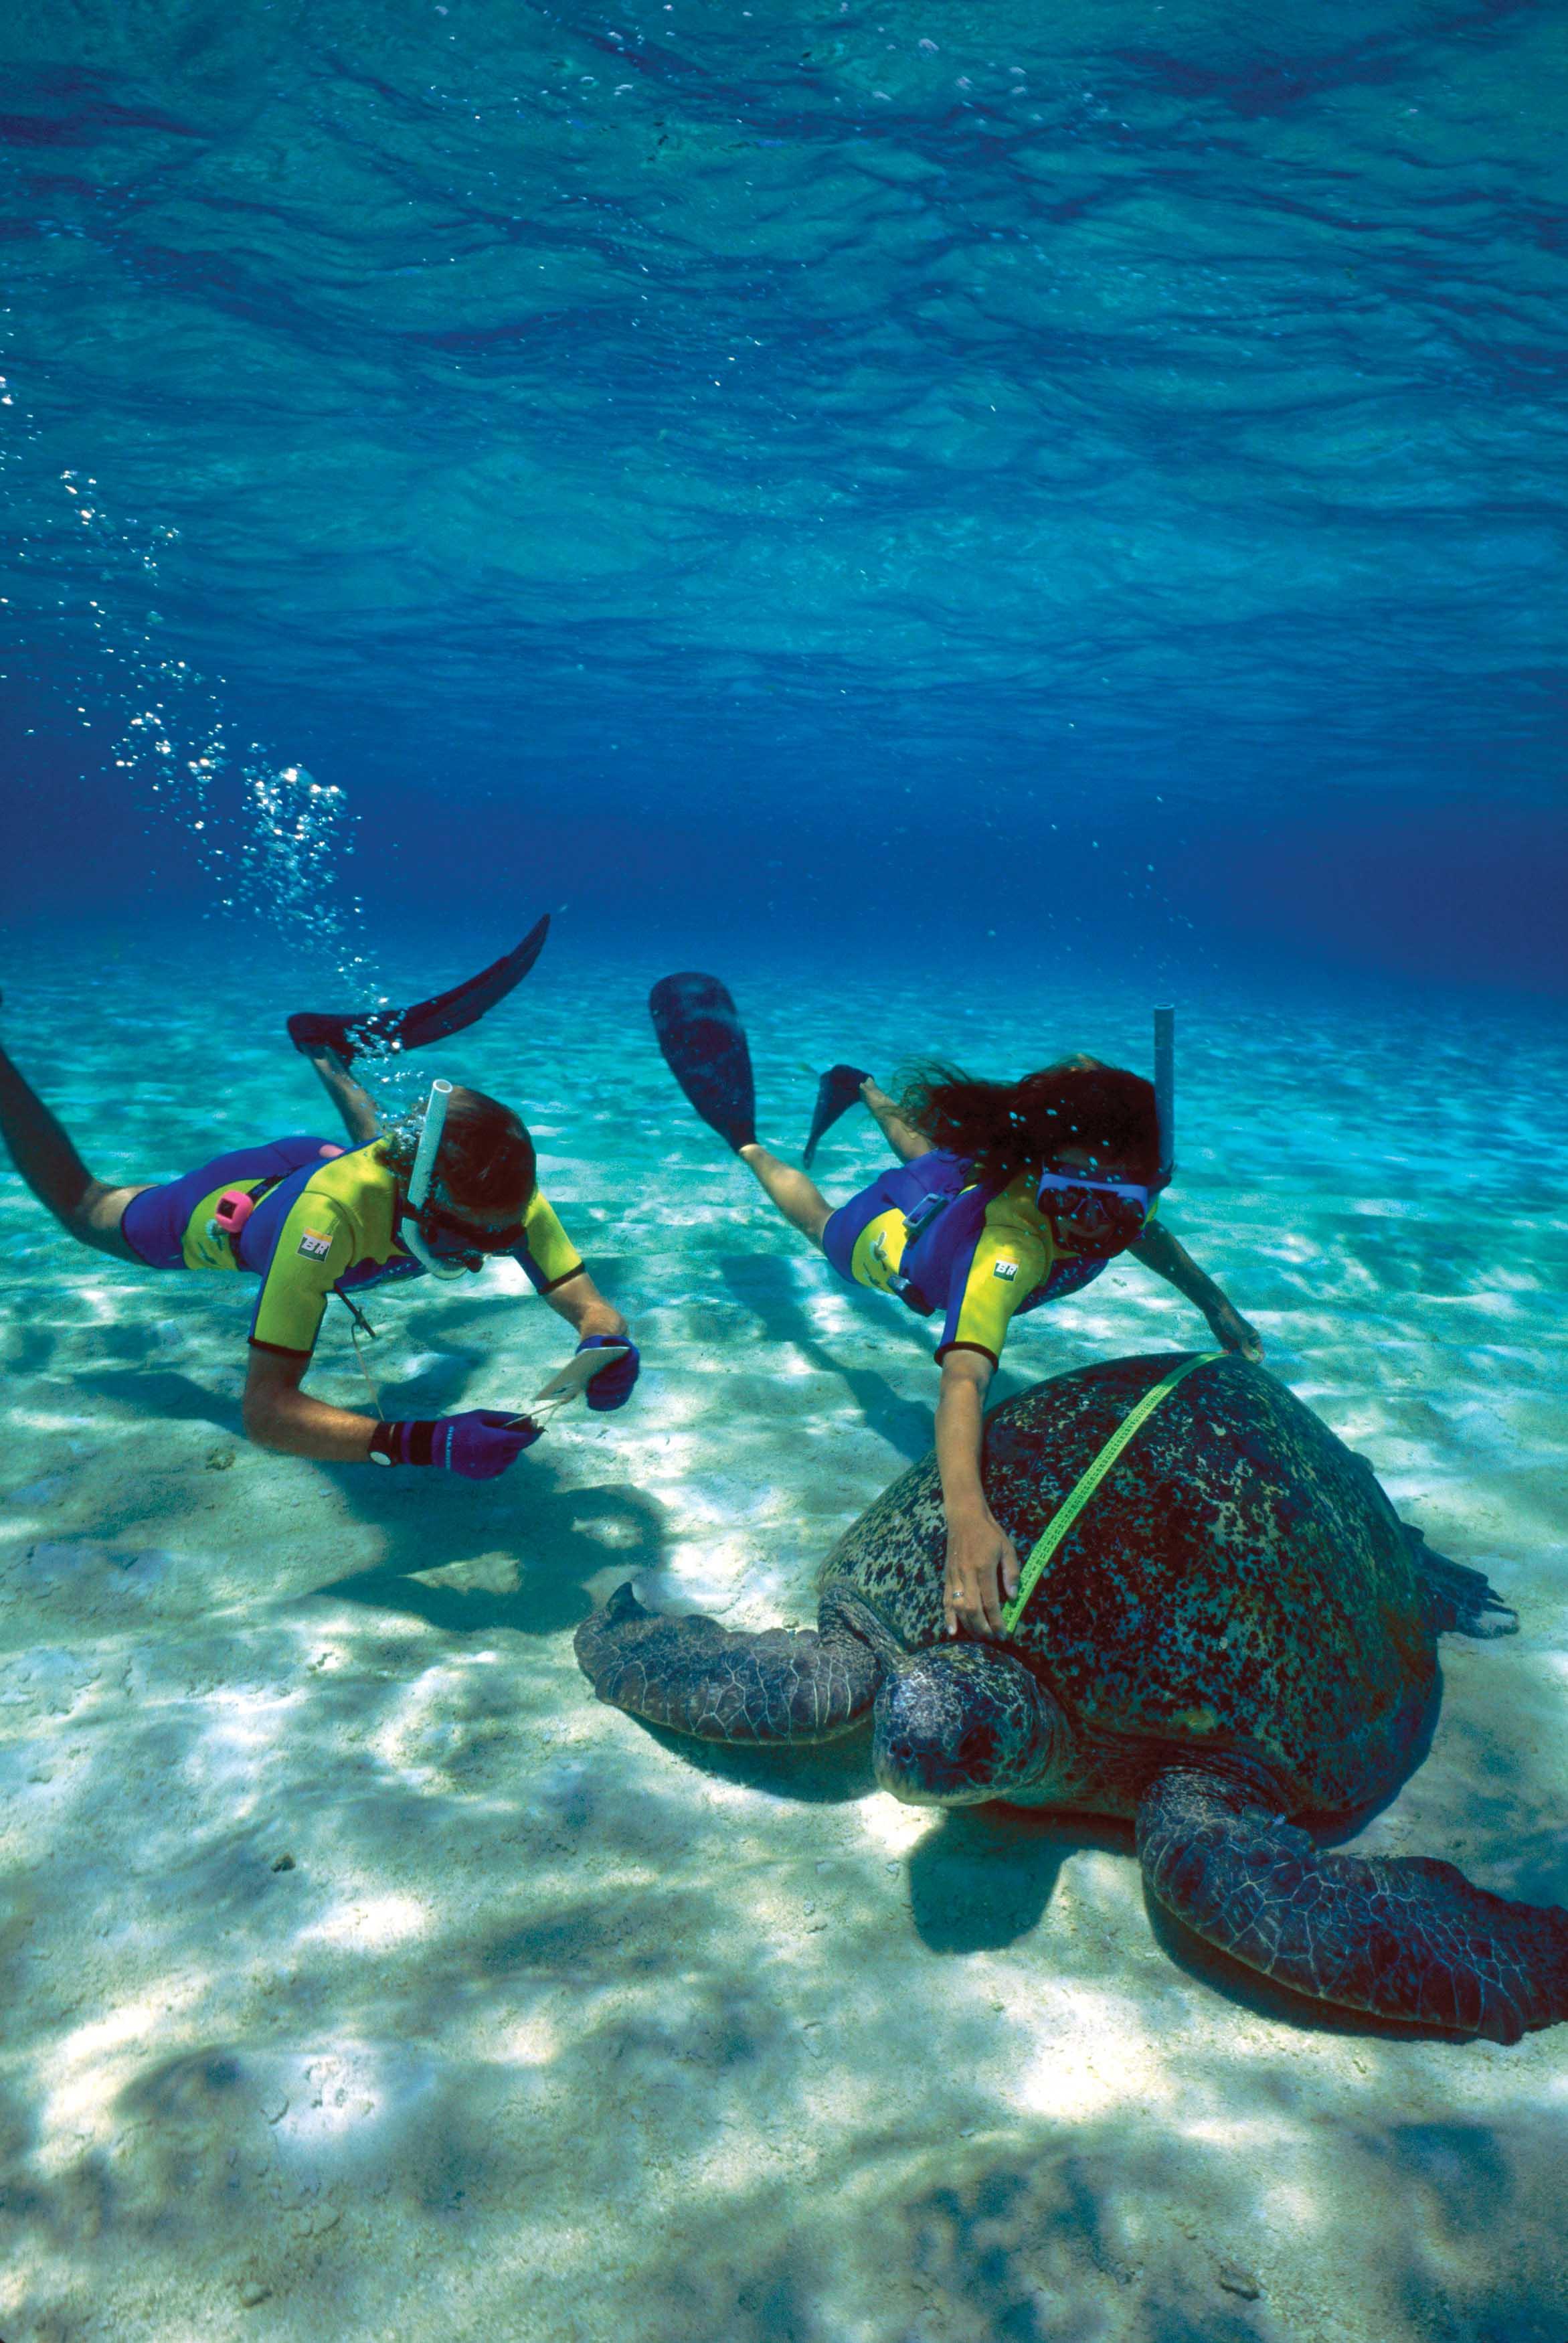 Researchers measure a green turtle at Atol das Rocas, Brazil. © Projeto TAMAR Image Bank